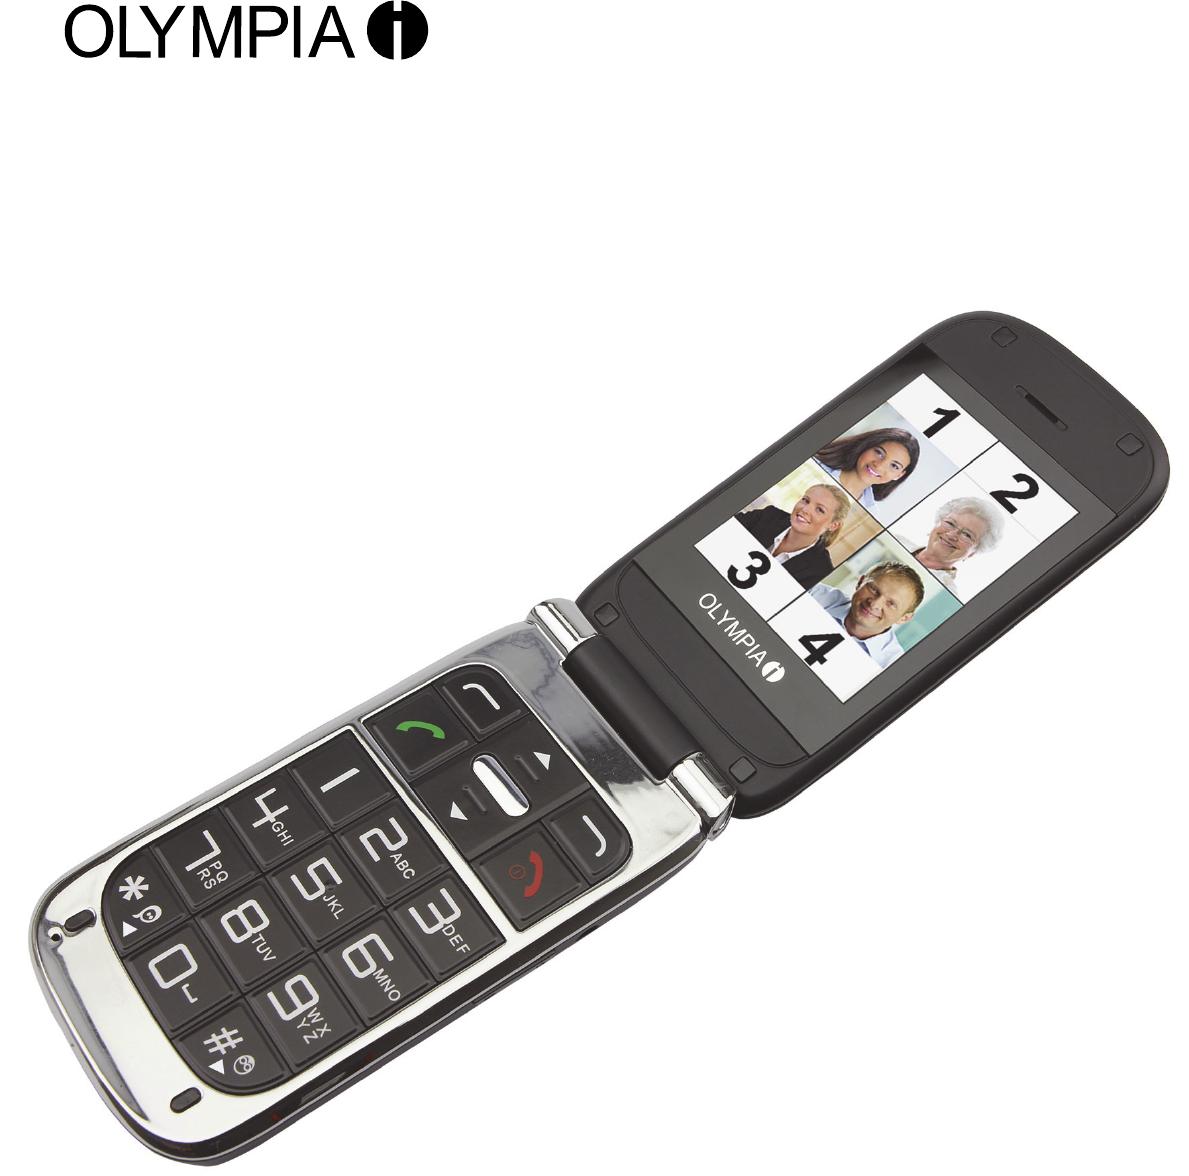 Bedienungsanleitung Olympia